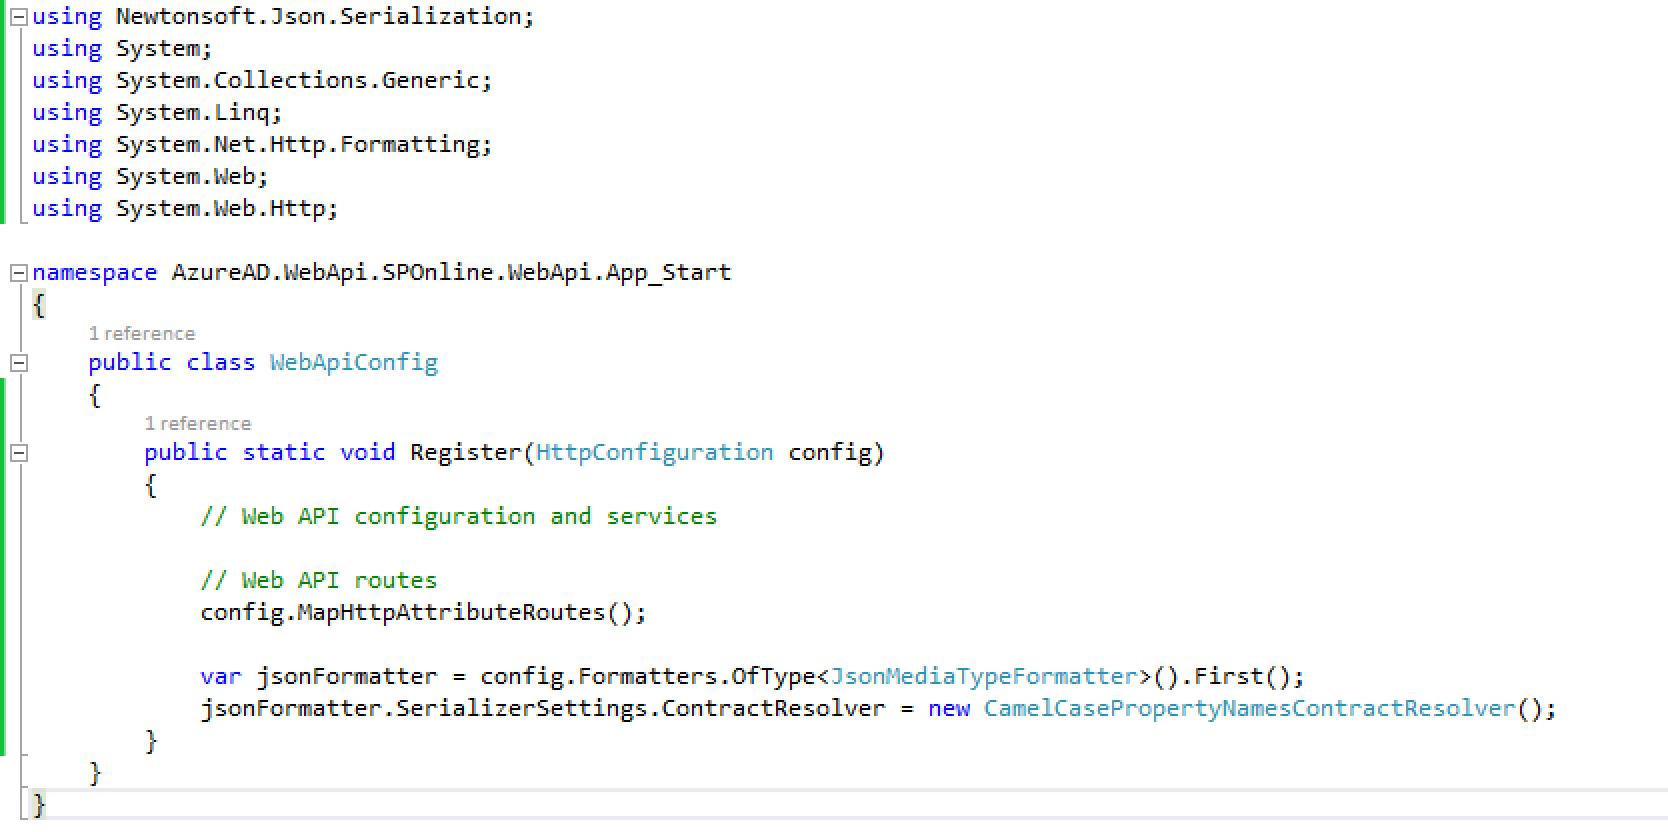 WebApiConfig code